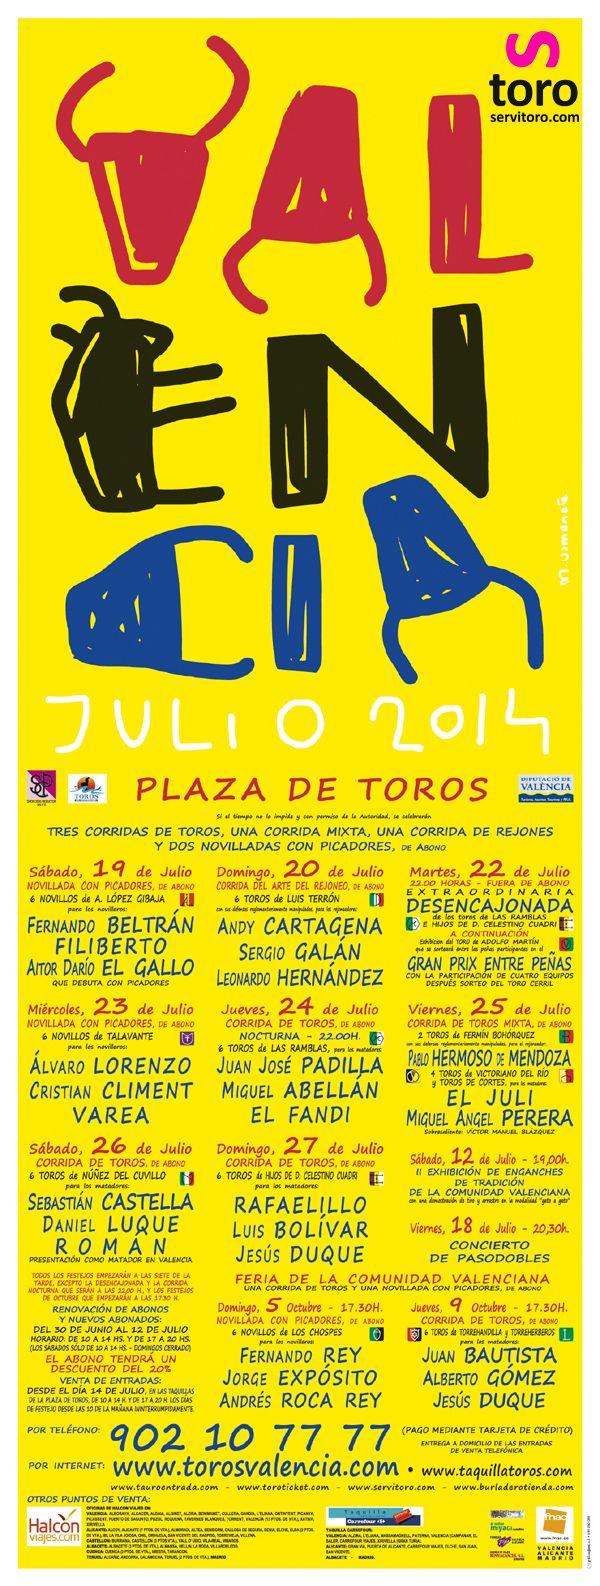 Feria de #Valencia Julio 2014. Compre sus entradas: http://www.servitoro.com/Entradas-Toros-Valencia.html